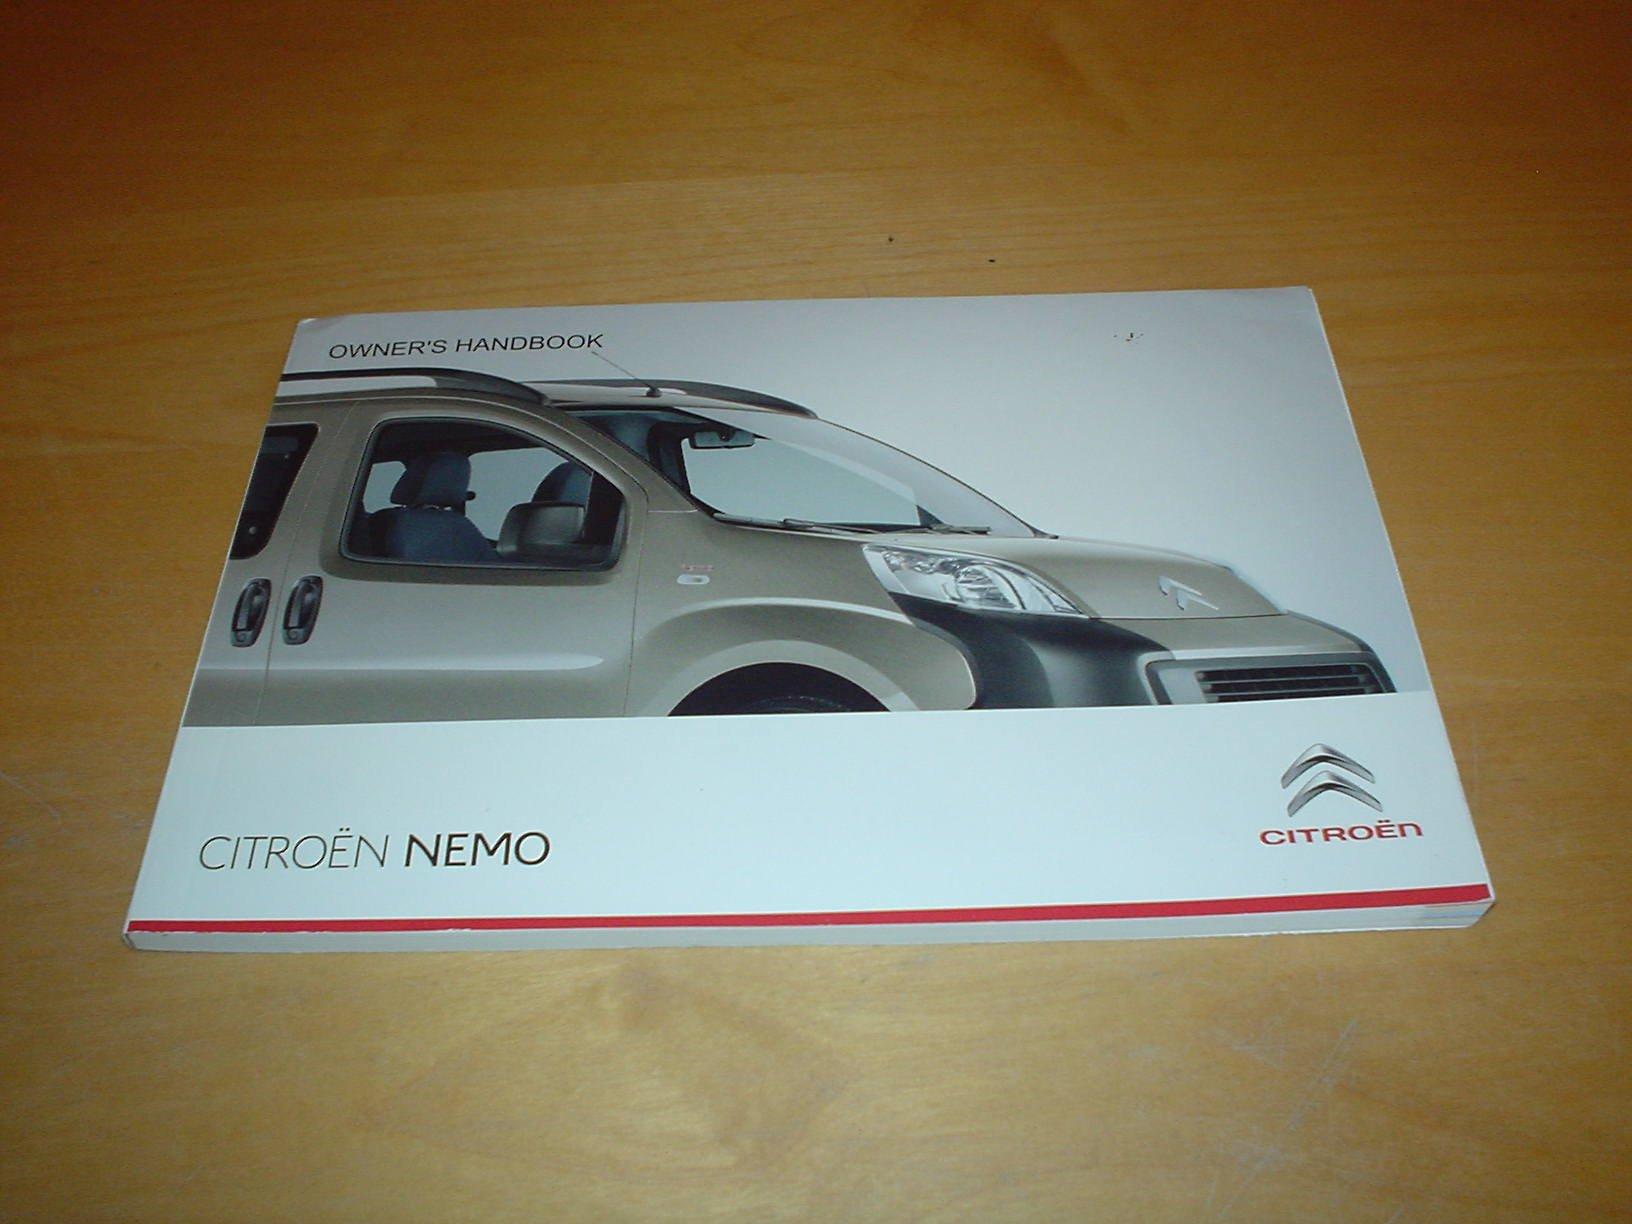 citroen nemo owners handbook light van combi 1 4 petrol engine rh amazon co uk Automobile Owners Manual Car Owners Manual